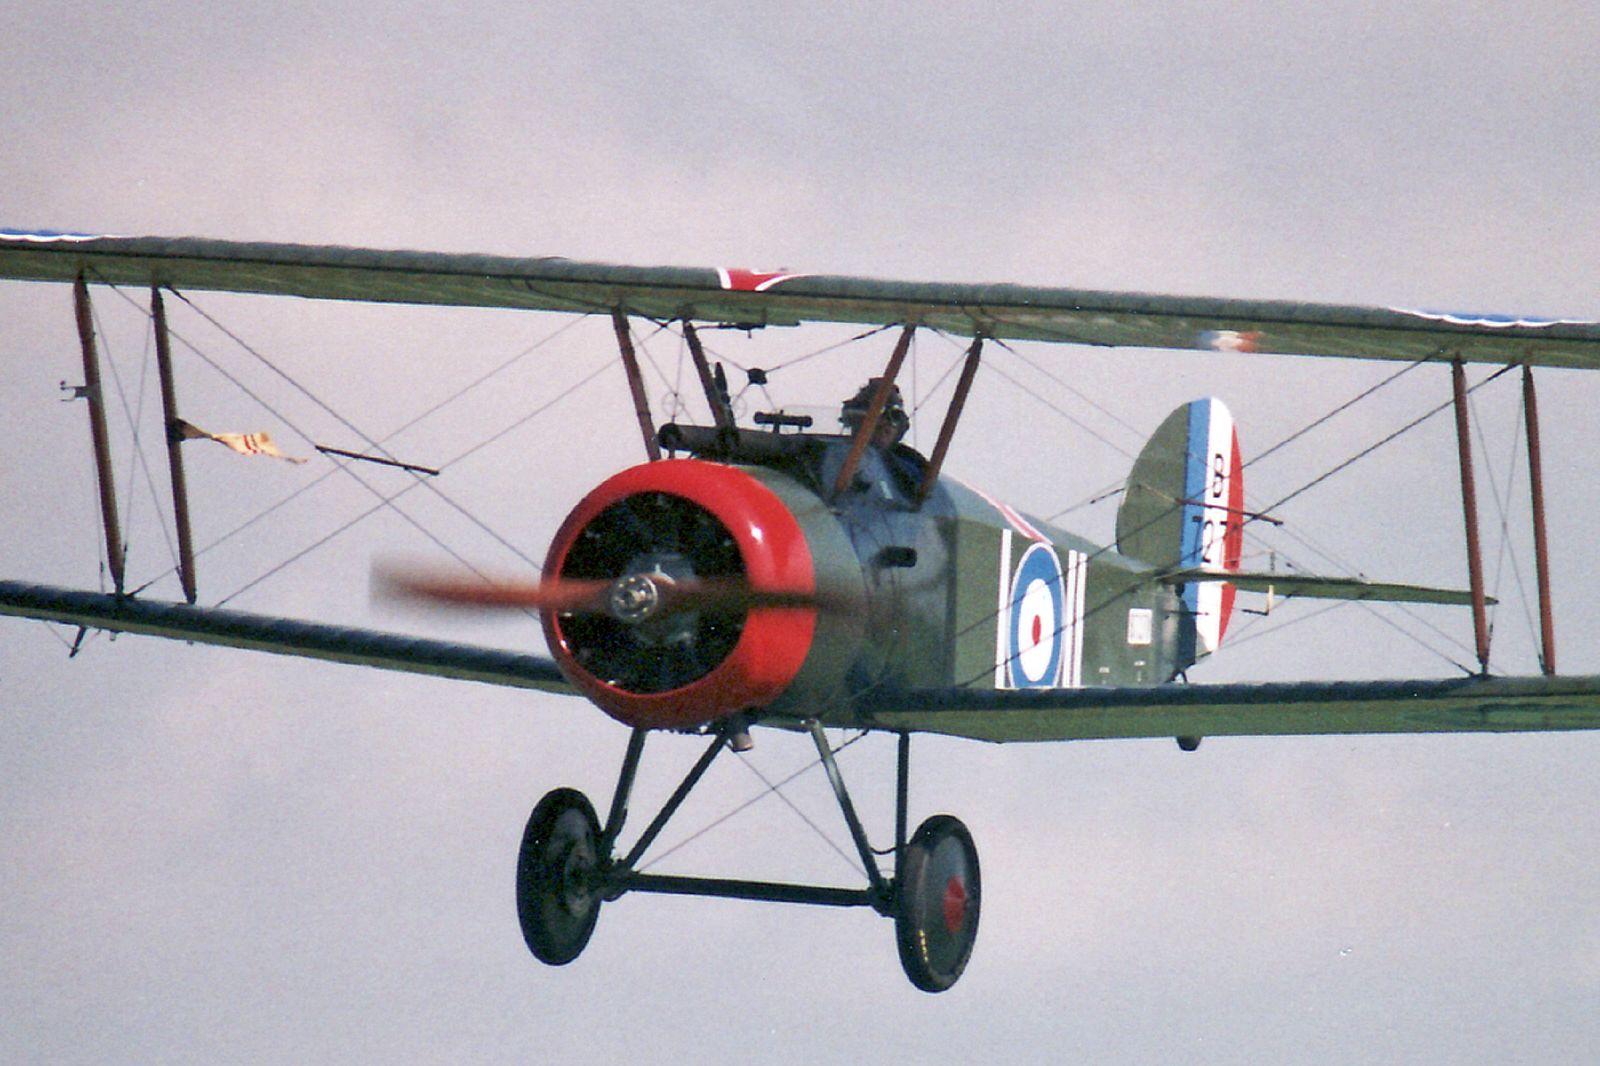 Sopwith Camel - Replica in Flight